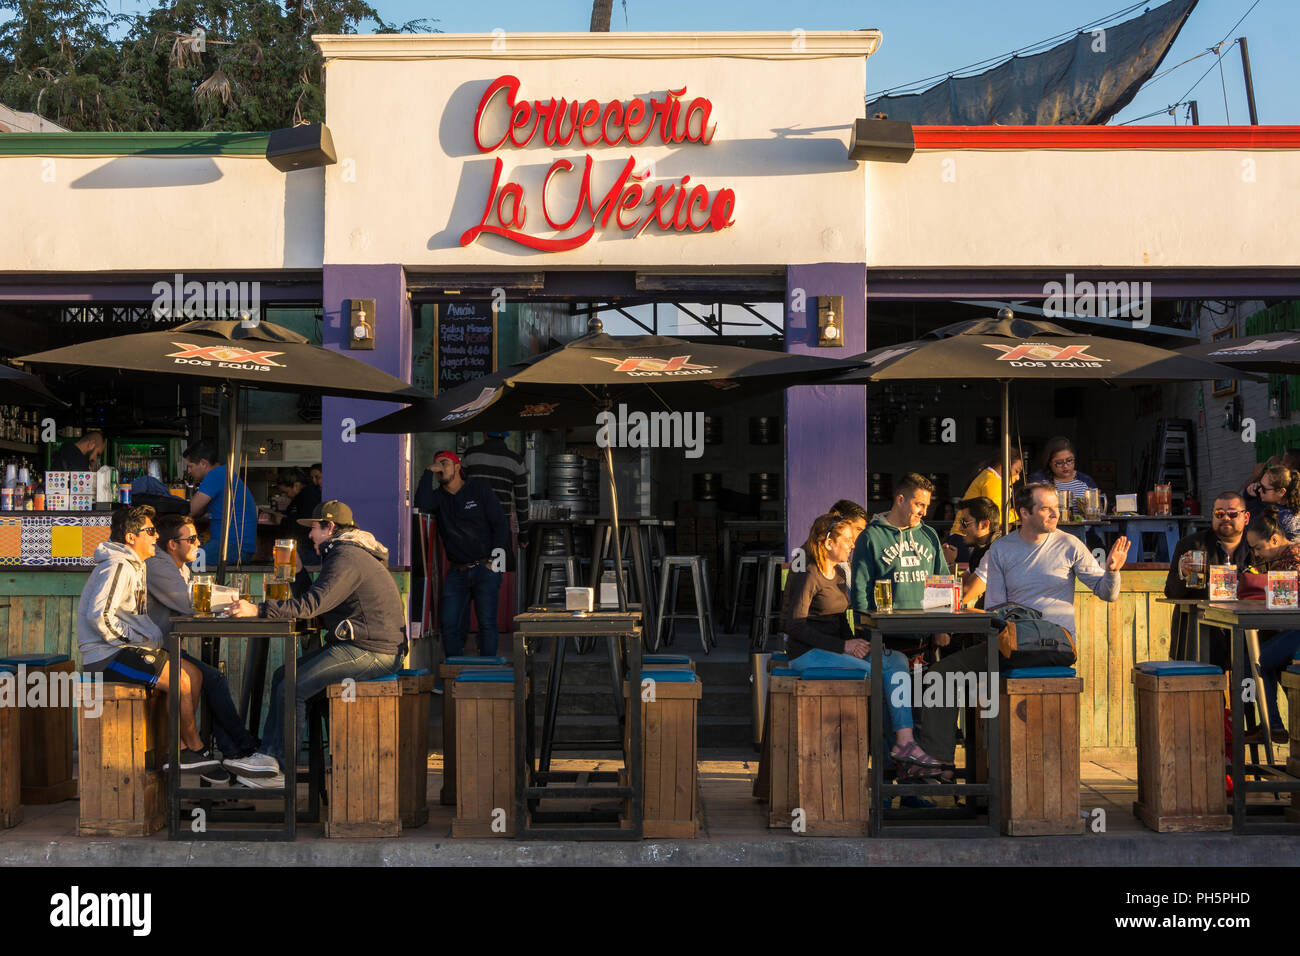 Cerveceria La Mexico bar in La Paz, Baja California Sur, Mexico. - Stock Image